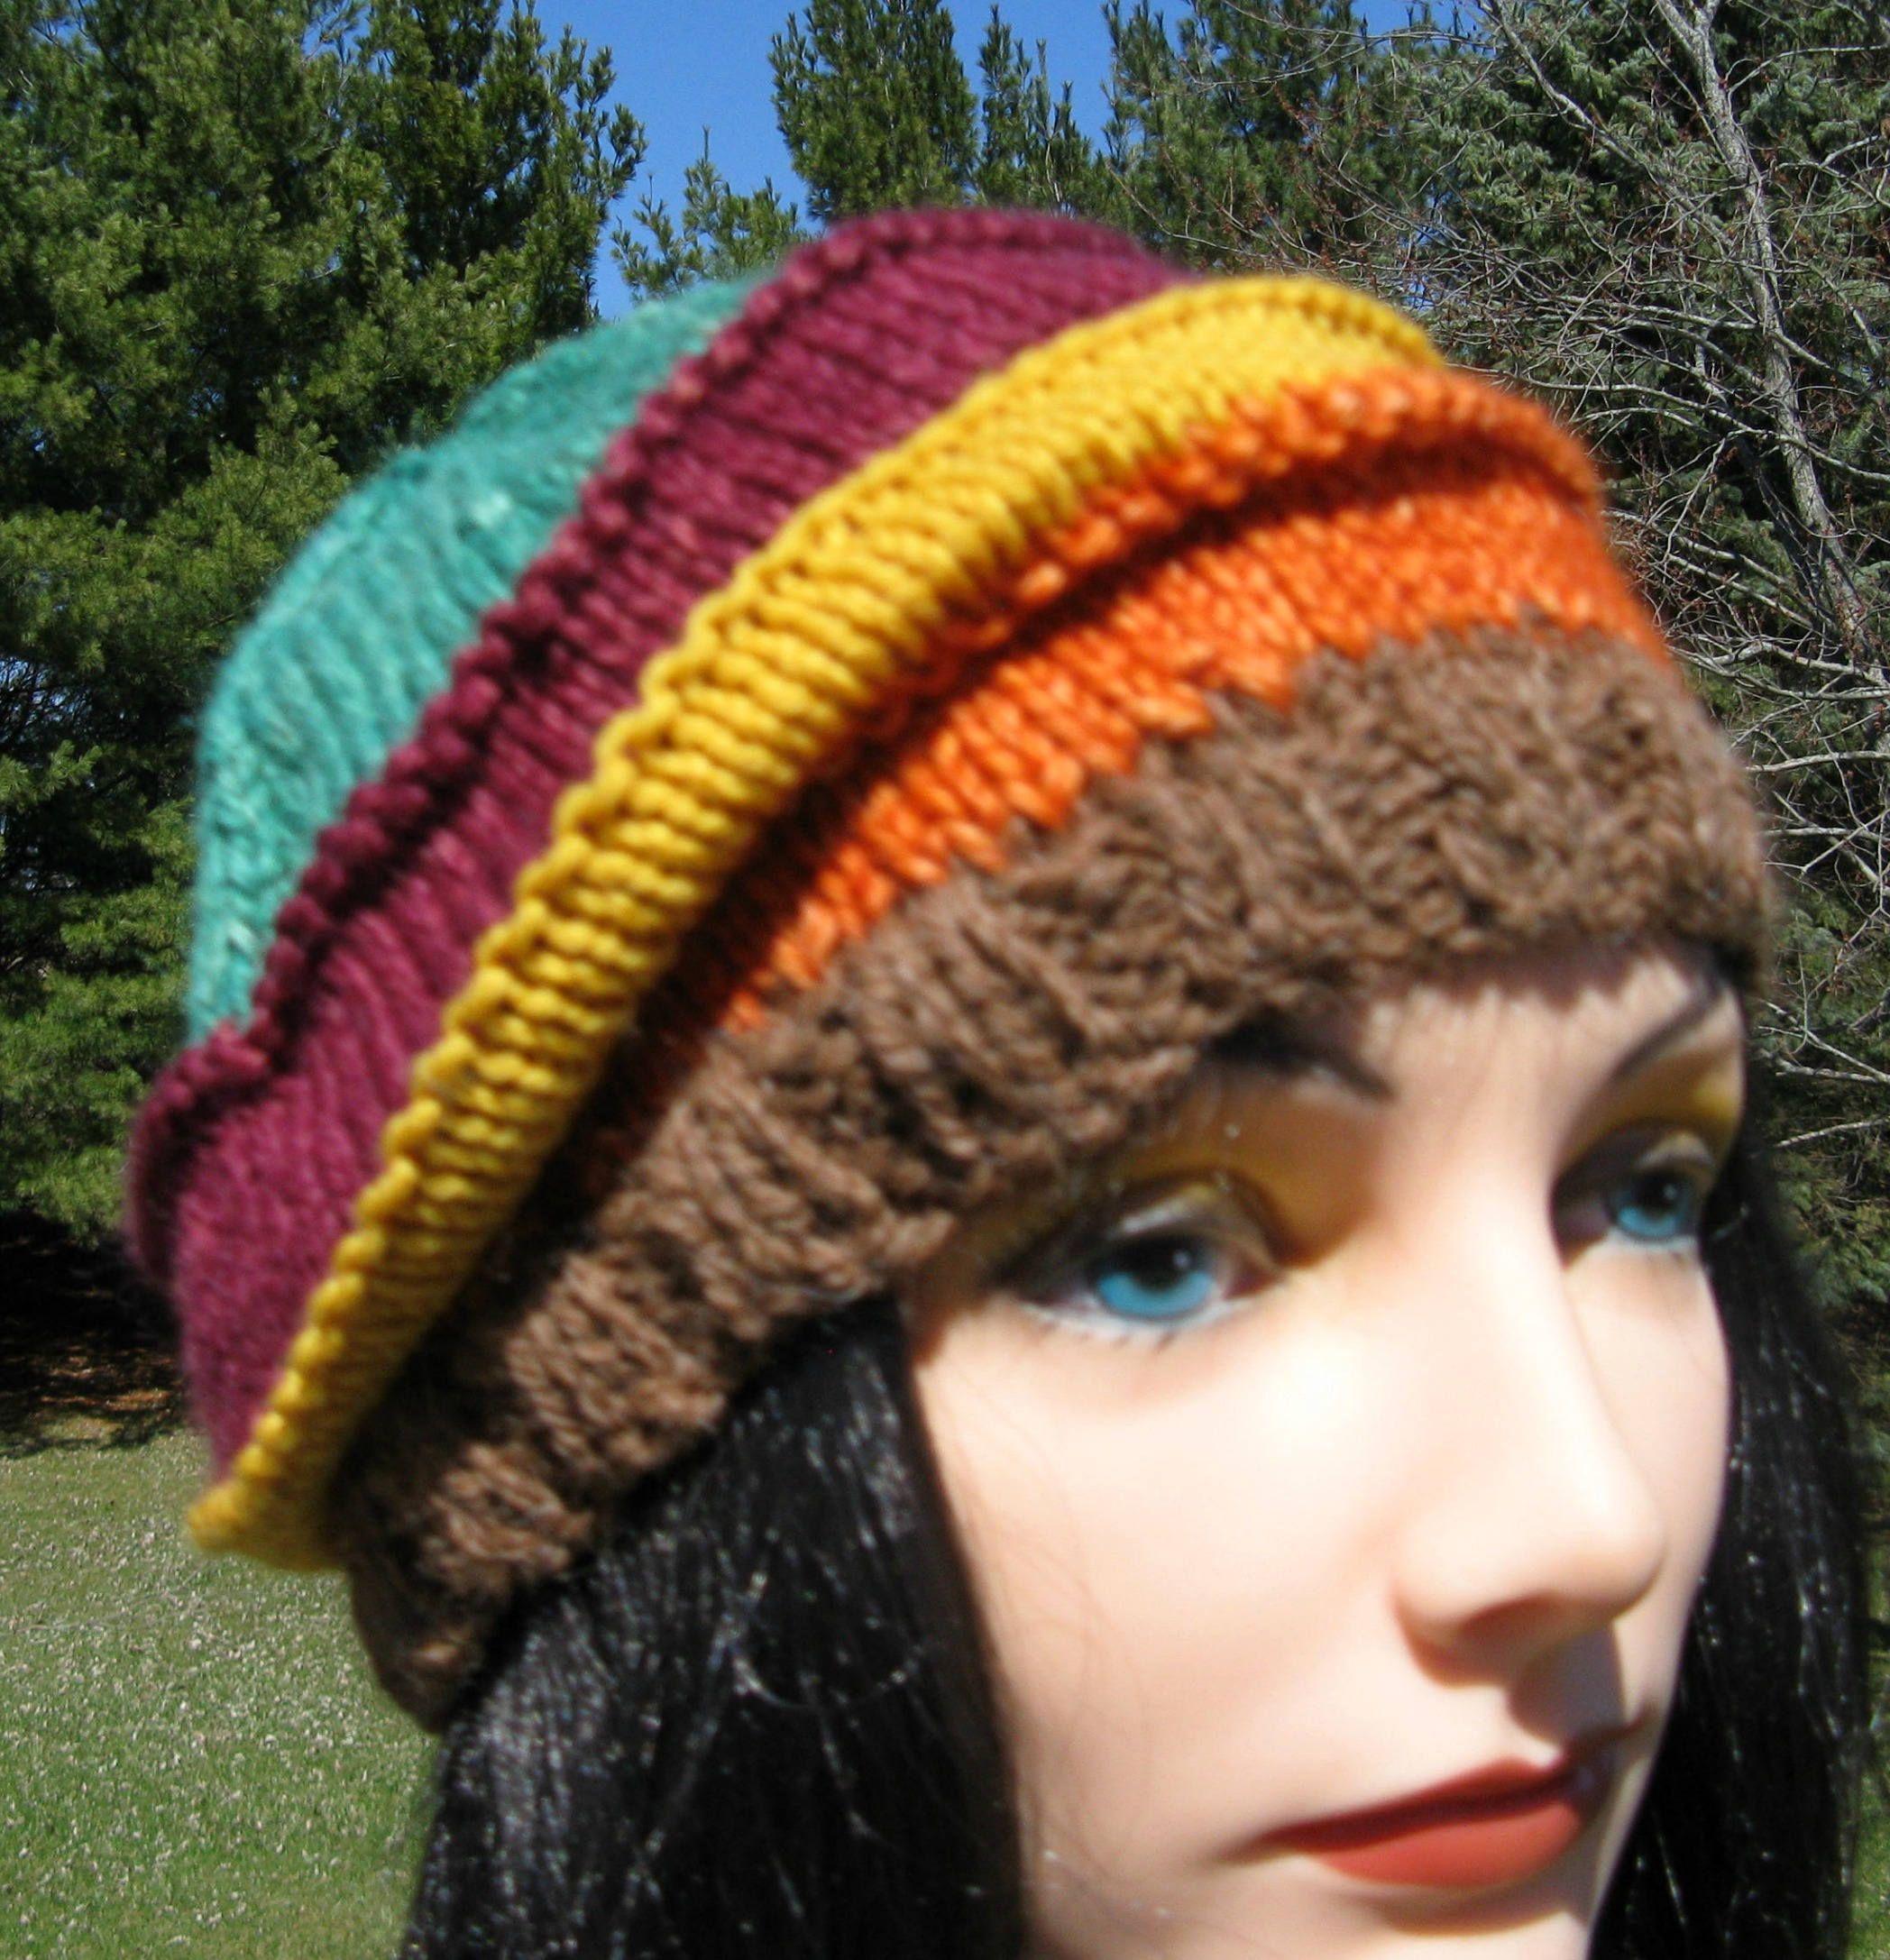 Knit Wool Hat for Men or Women, Alpaca Handmade Beanie, Warm Winter Beanie, Striped Slouch, Brown, Orange, Yellow, Burgundy and Green Hat by NorthStarAlpacas on Etsy